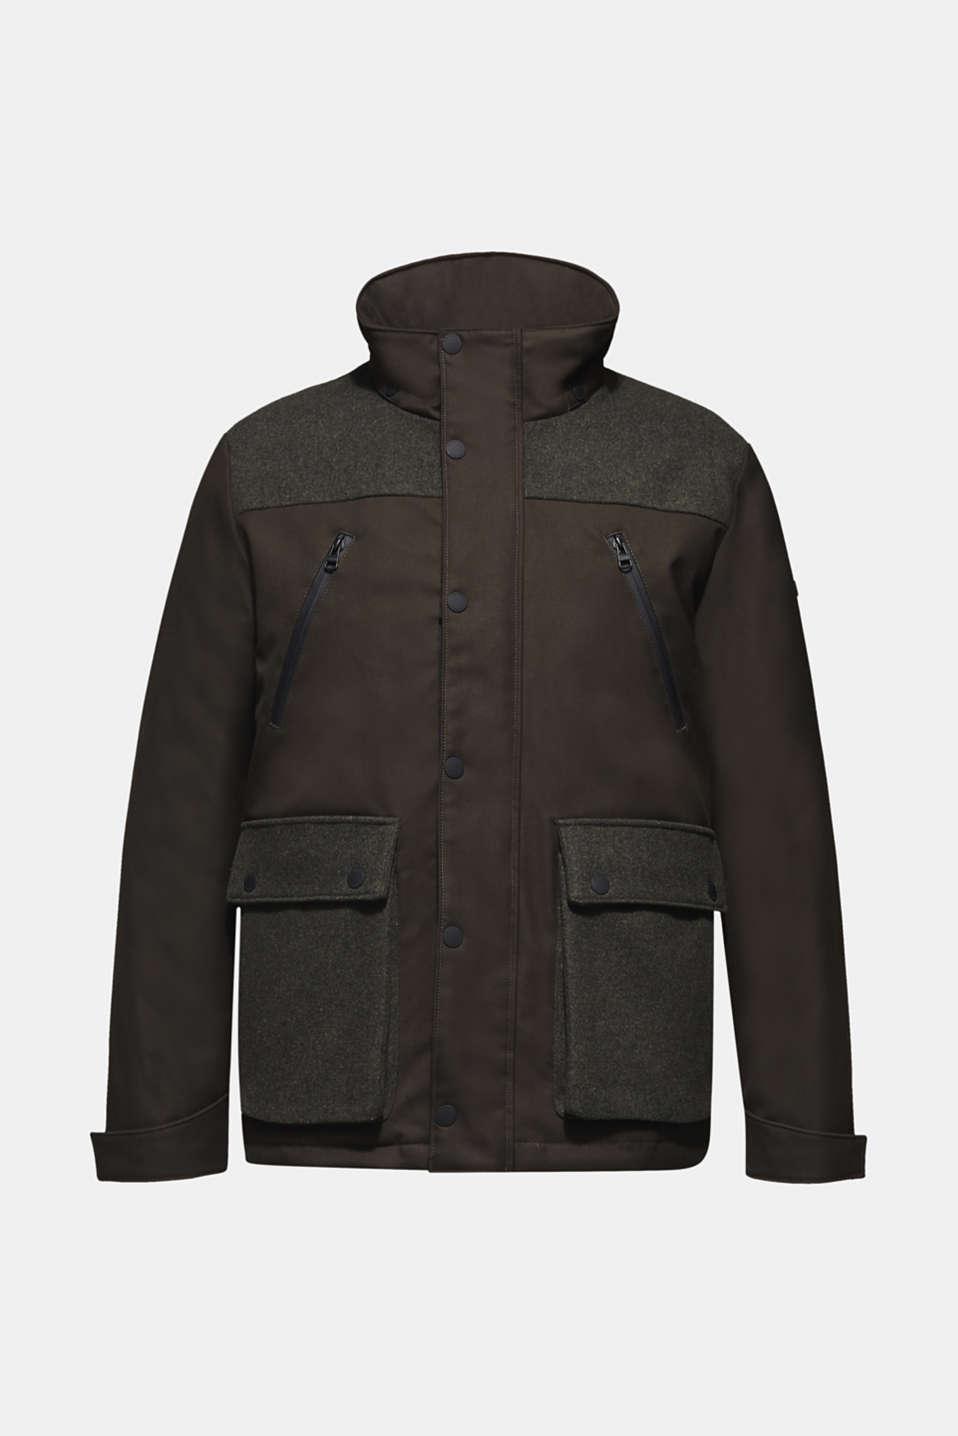 Jackets outdoor woven, DARK KHAKI, detail image number 8